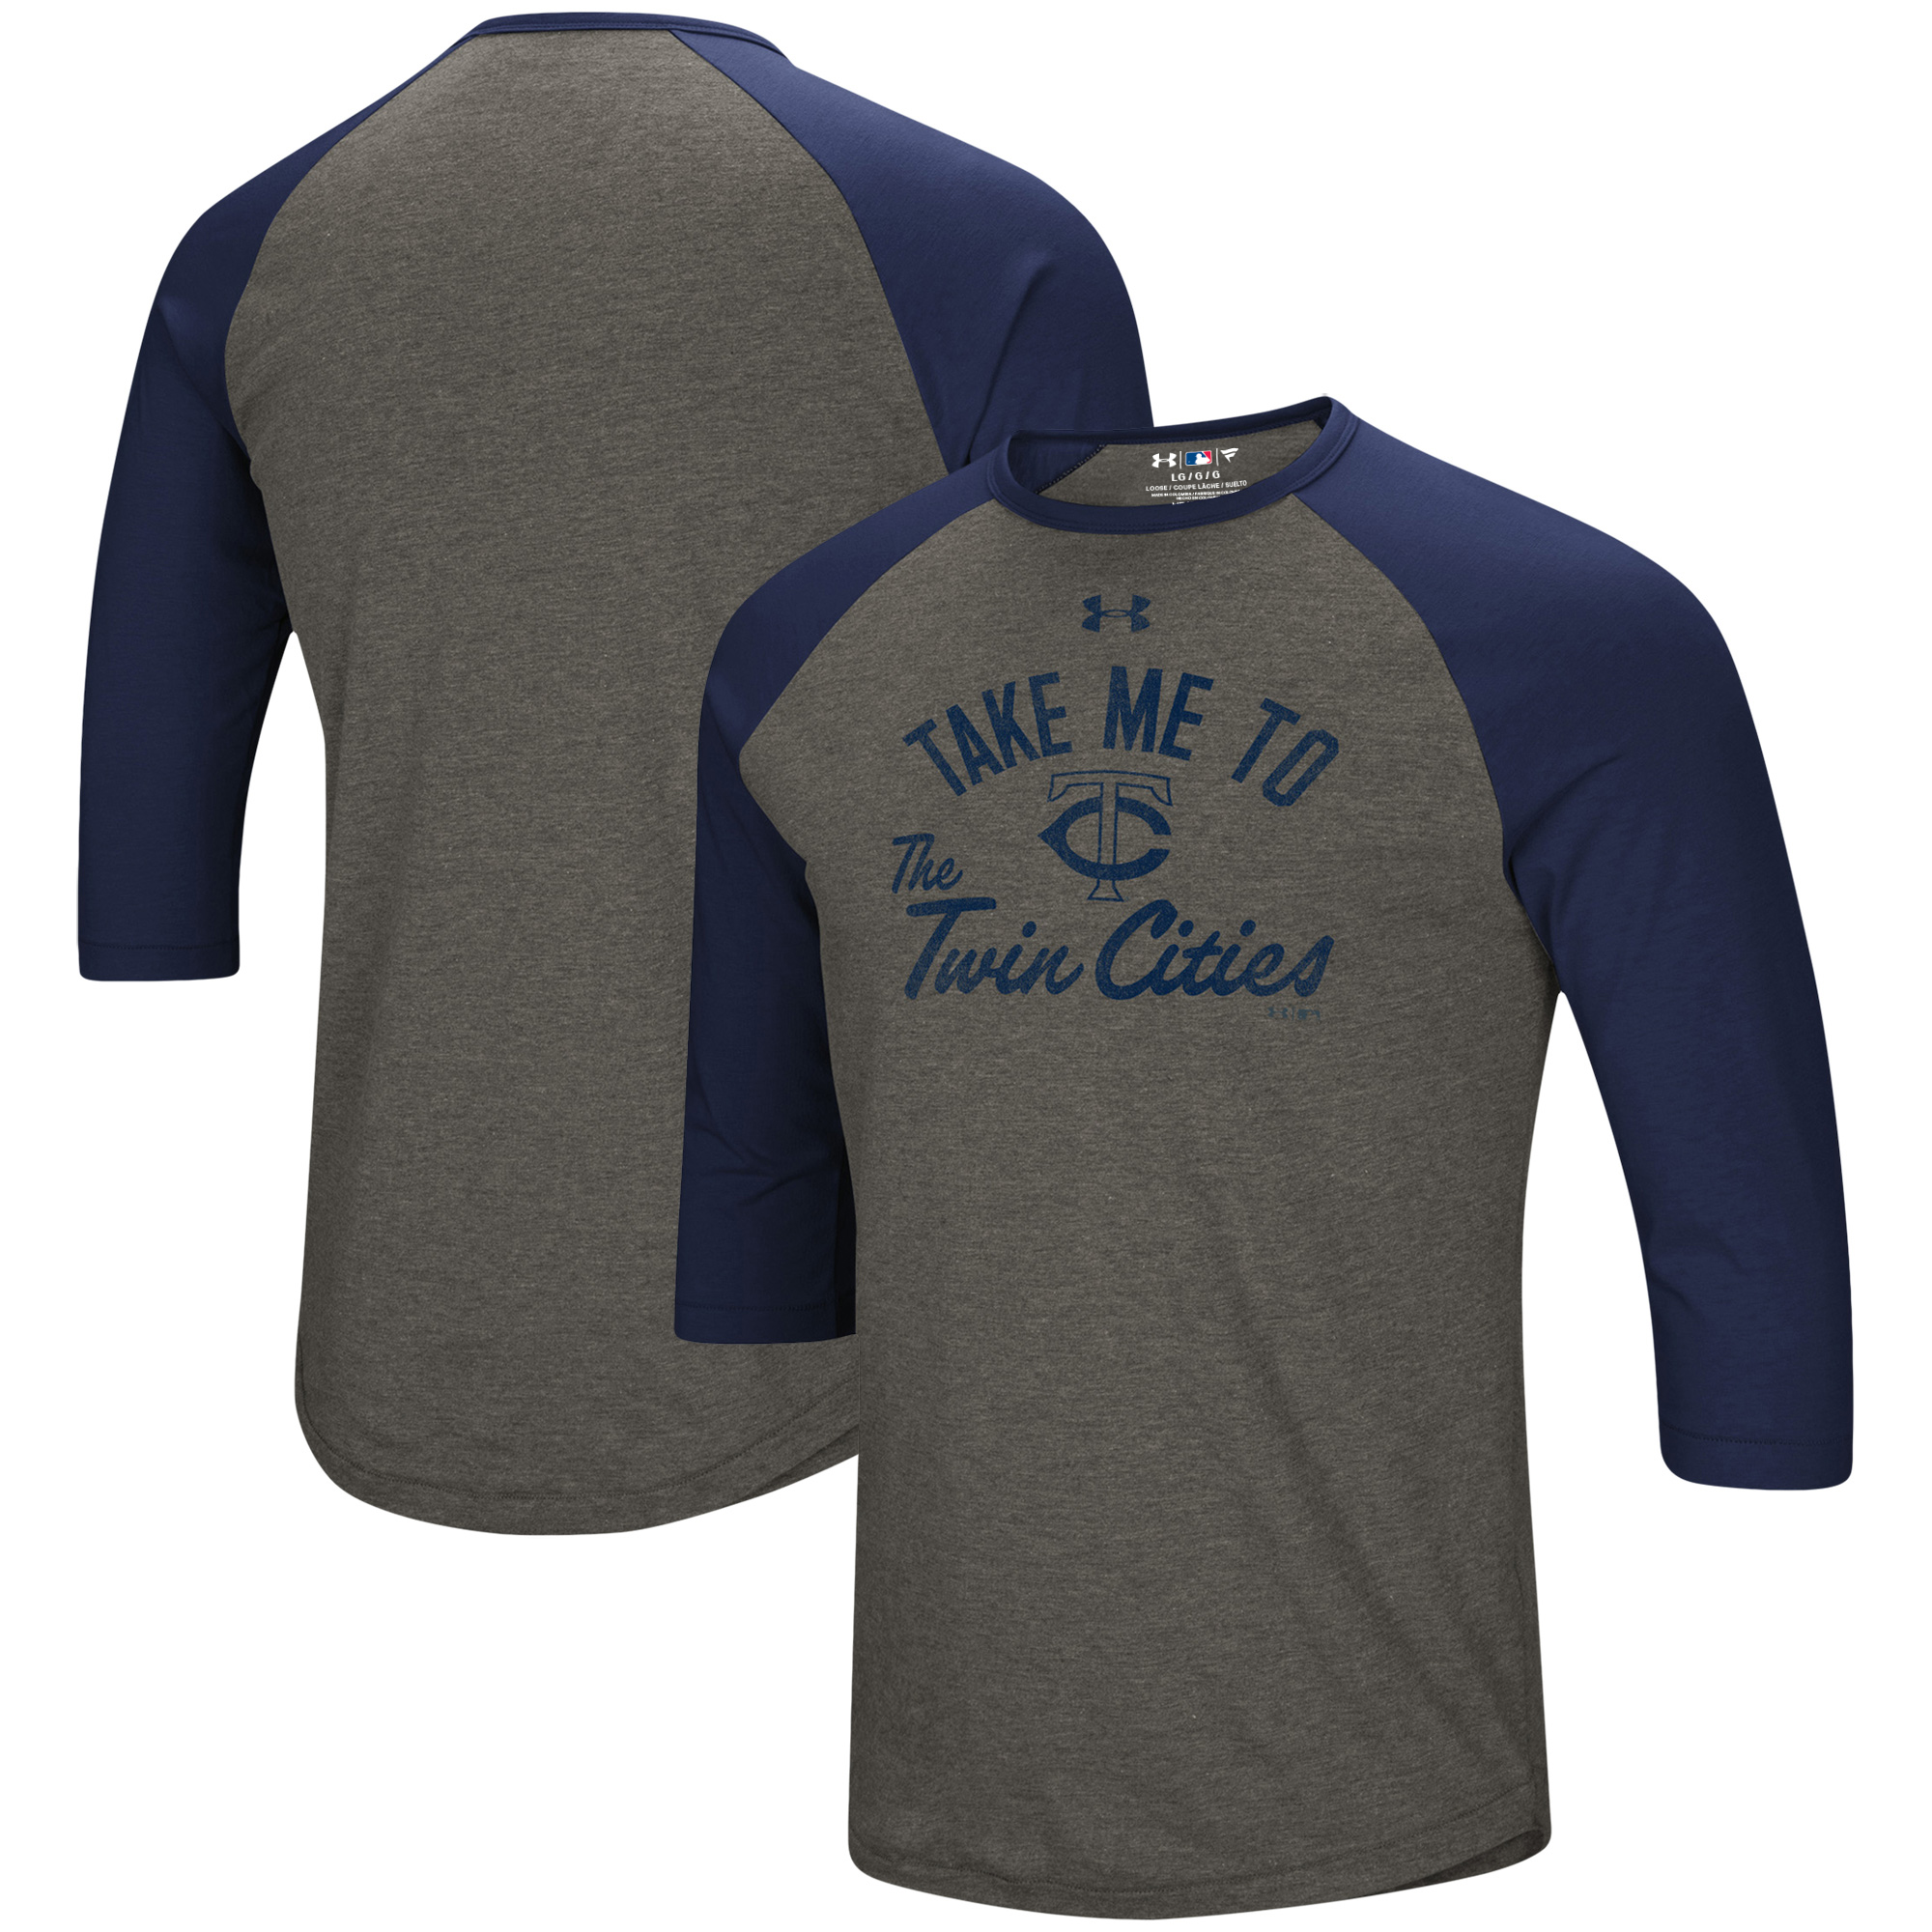 Minnesota Twins Under Armour Heritage Performance Tri-Blend Raglan 3/4-Sleeve T-Shirt - Heathered Gray/Navy